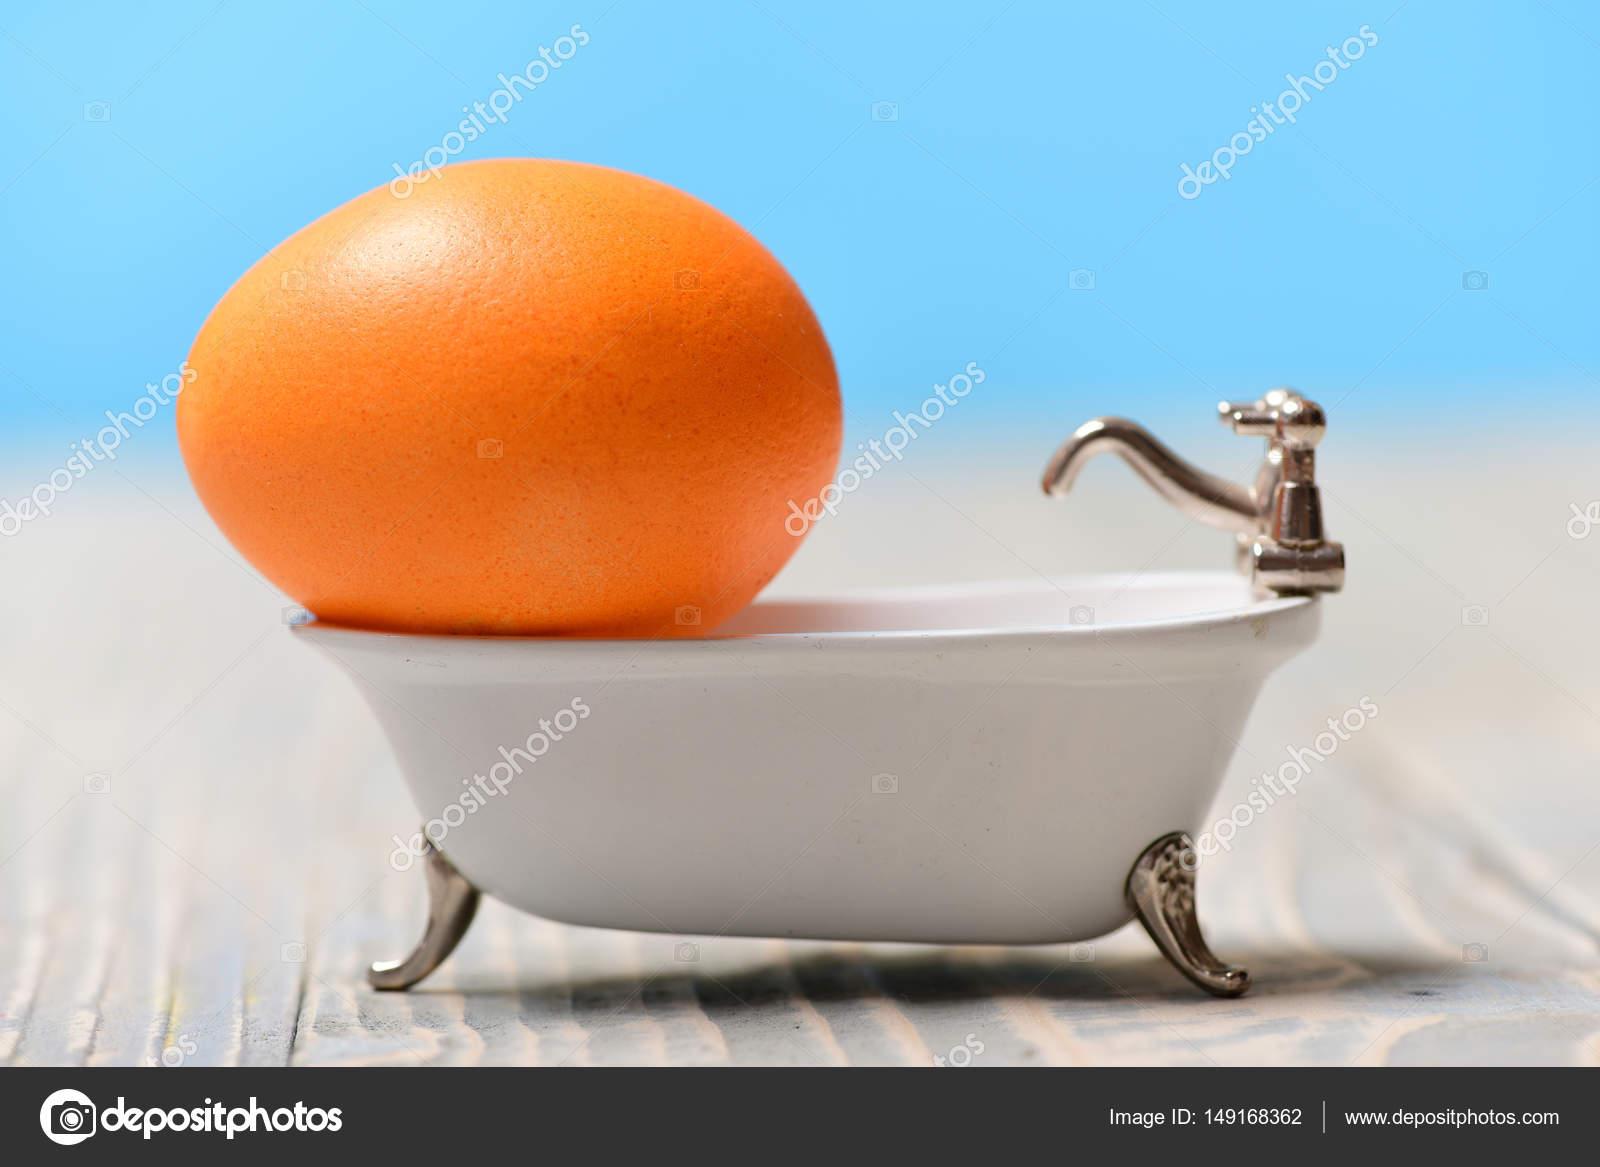 Vasca Da Bagno Uovo : Arancione dipinta uovo in vasca di bagno bianca vacanze di pasqua